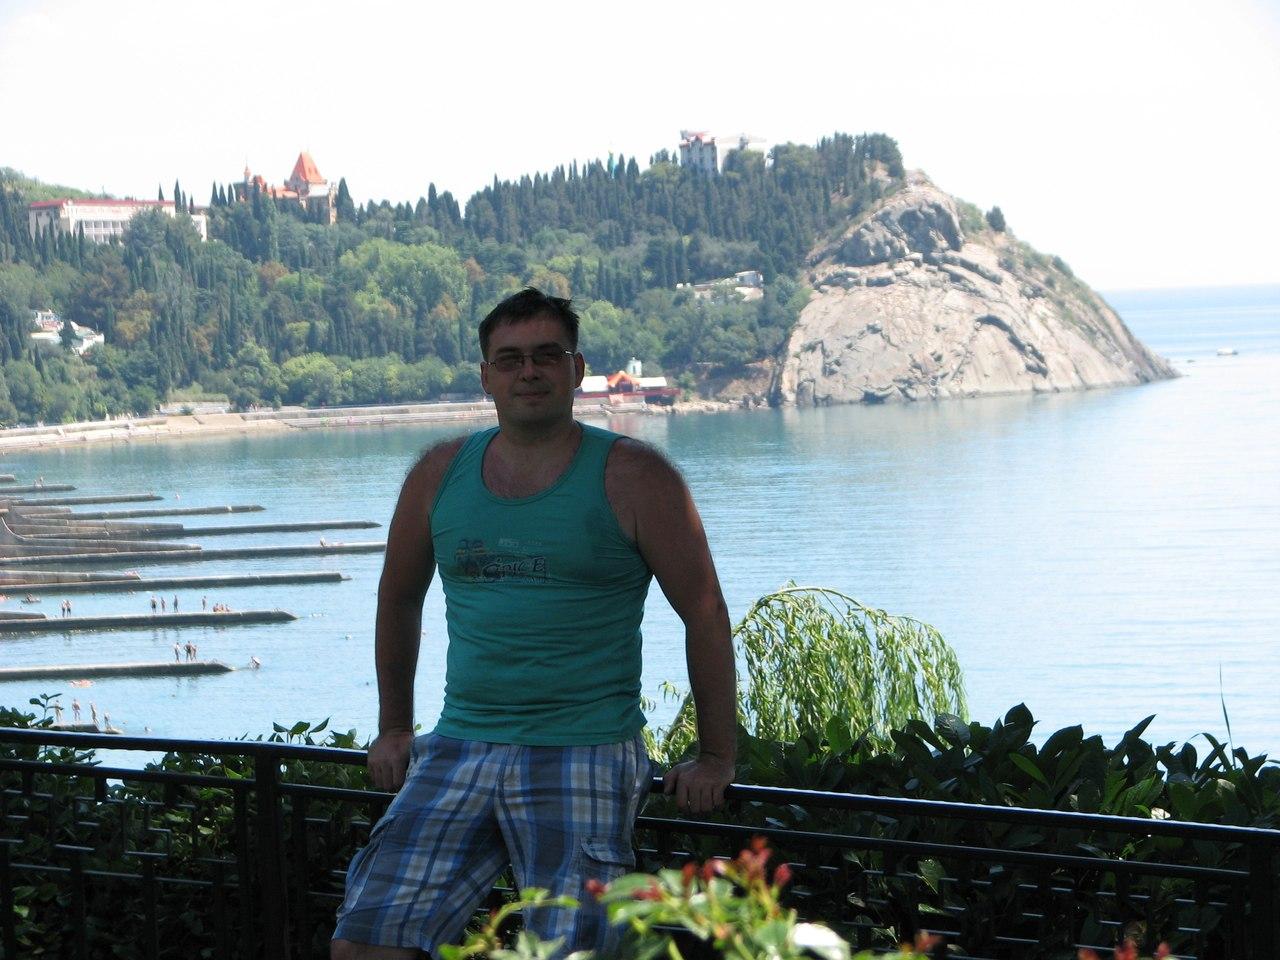 Сергей Святкин, Нижний Новгород - фото №2